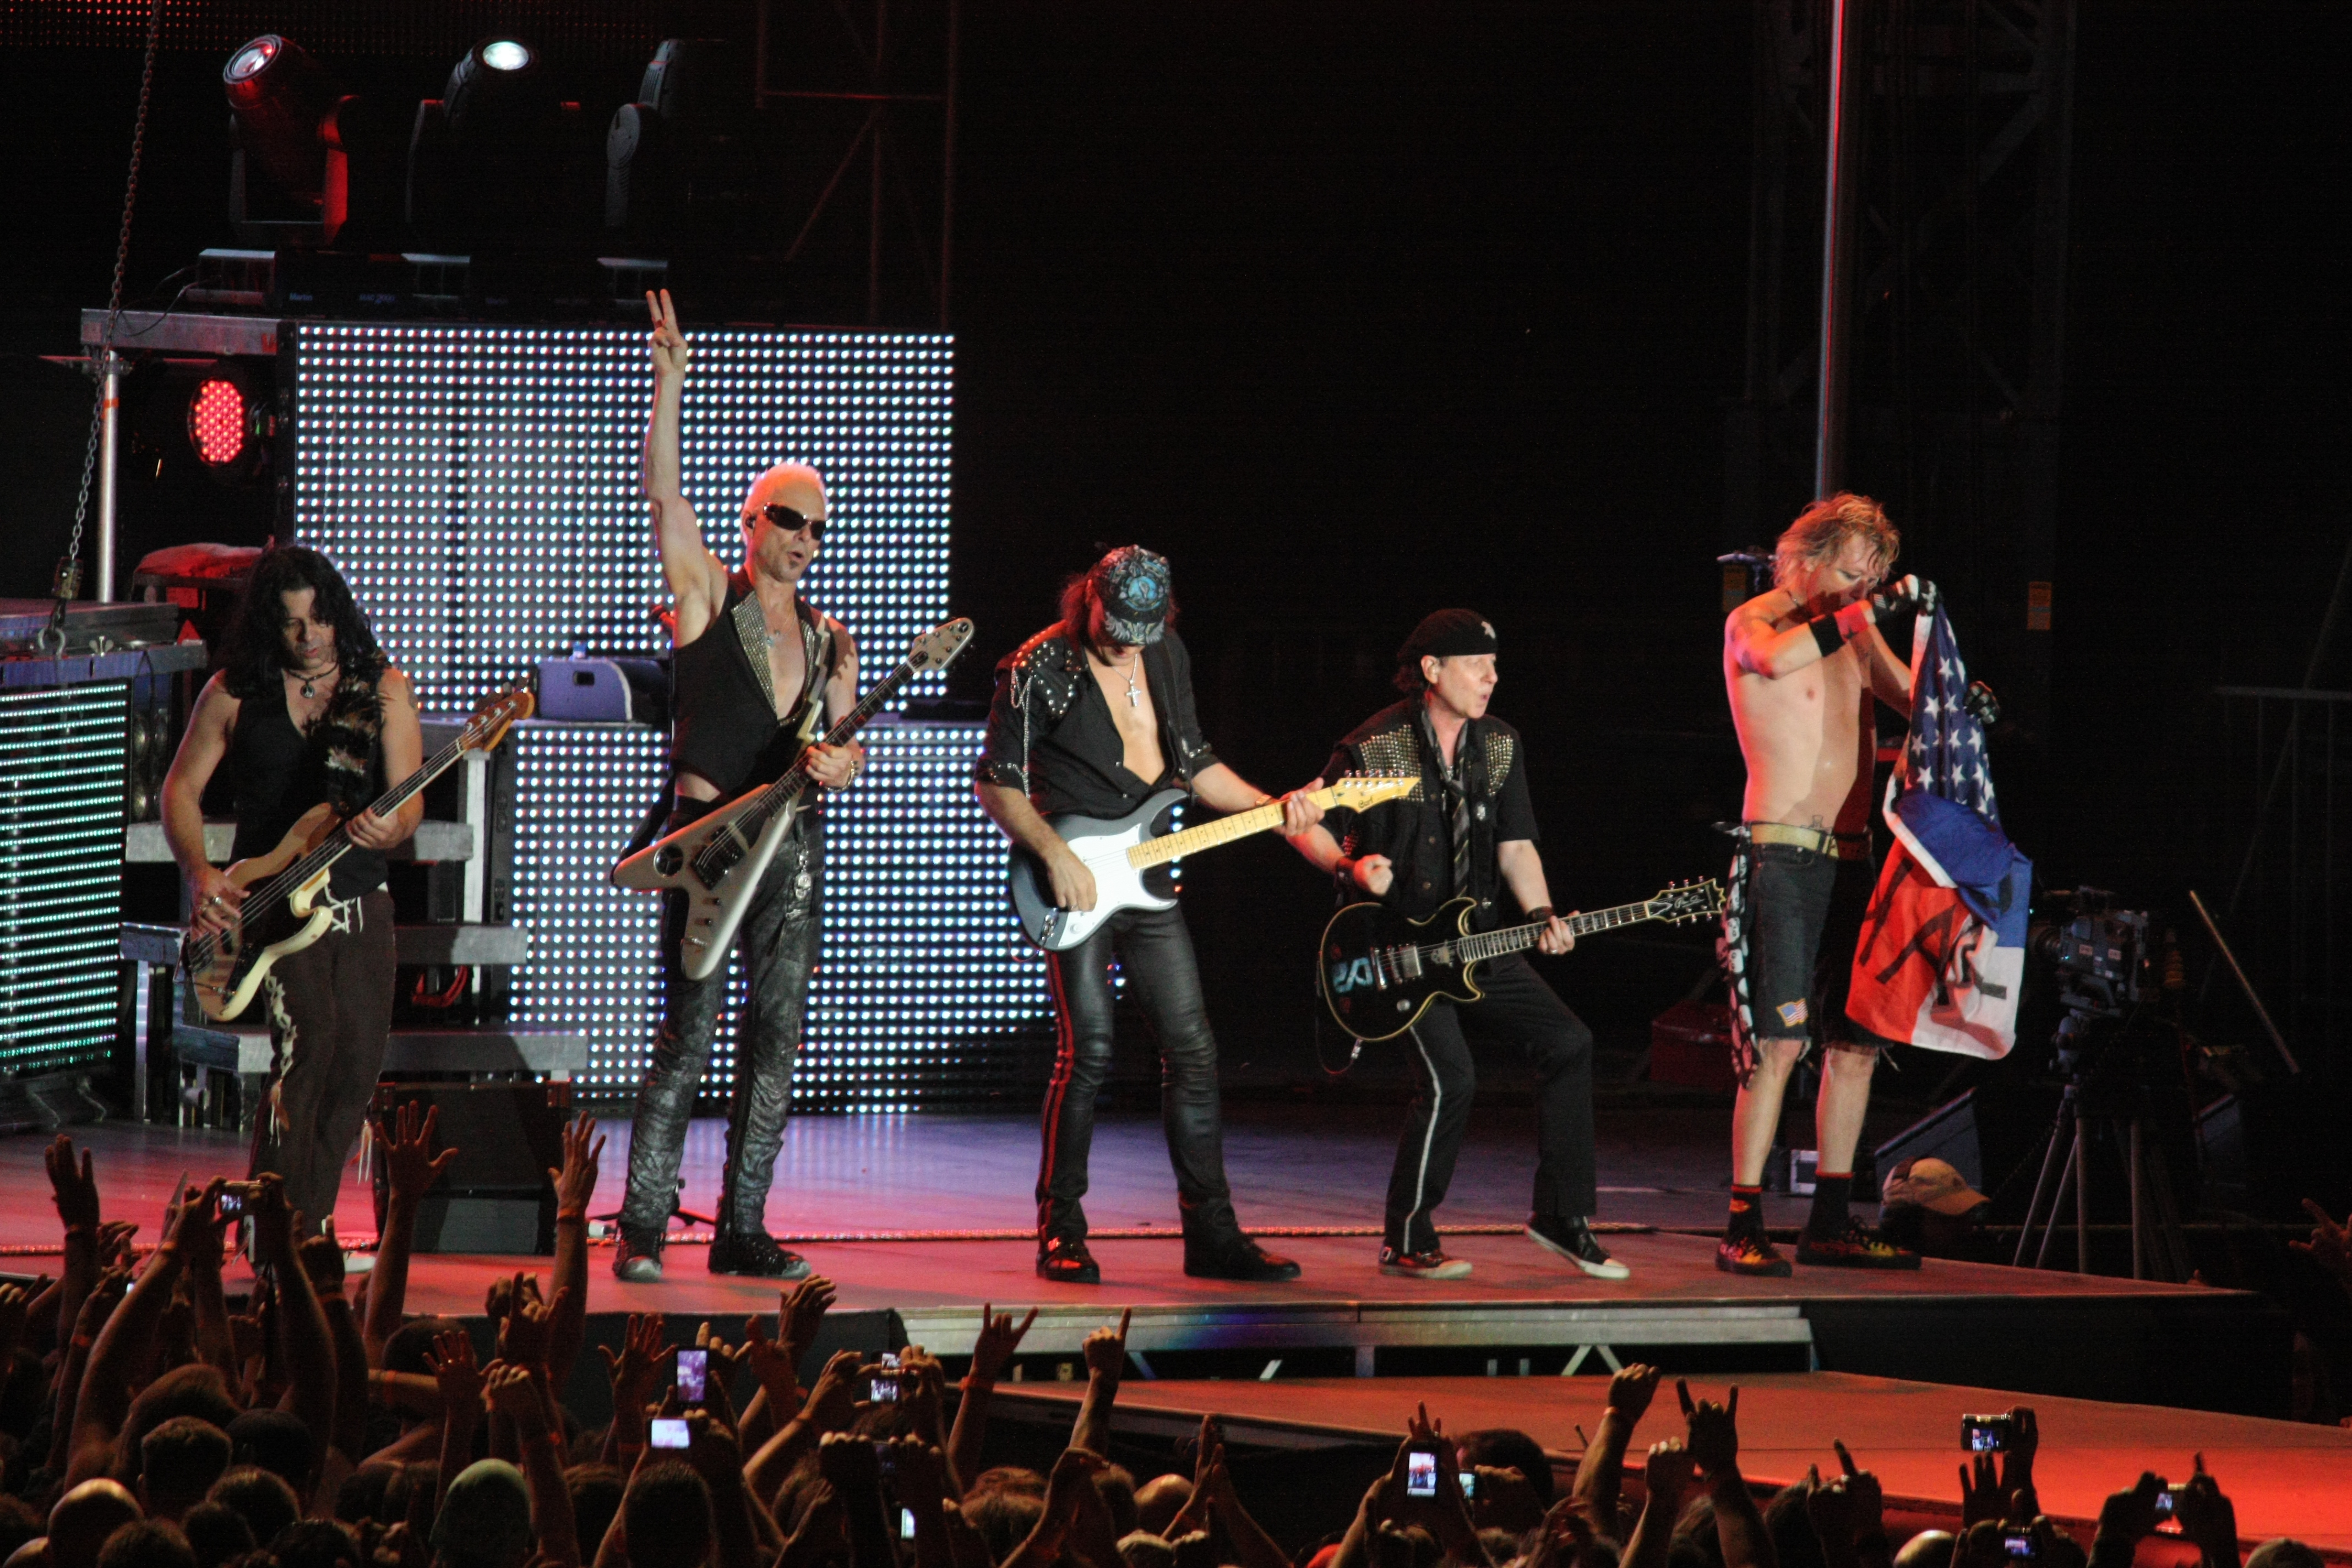 2007 концерт scorpions: